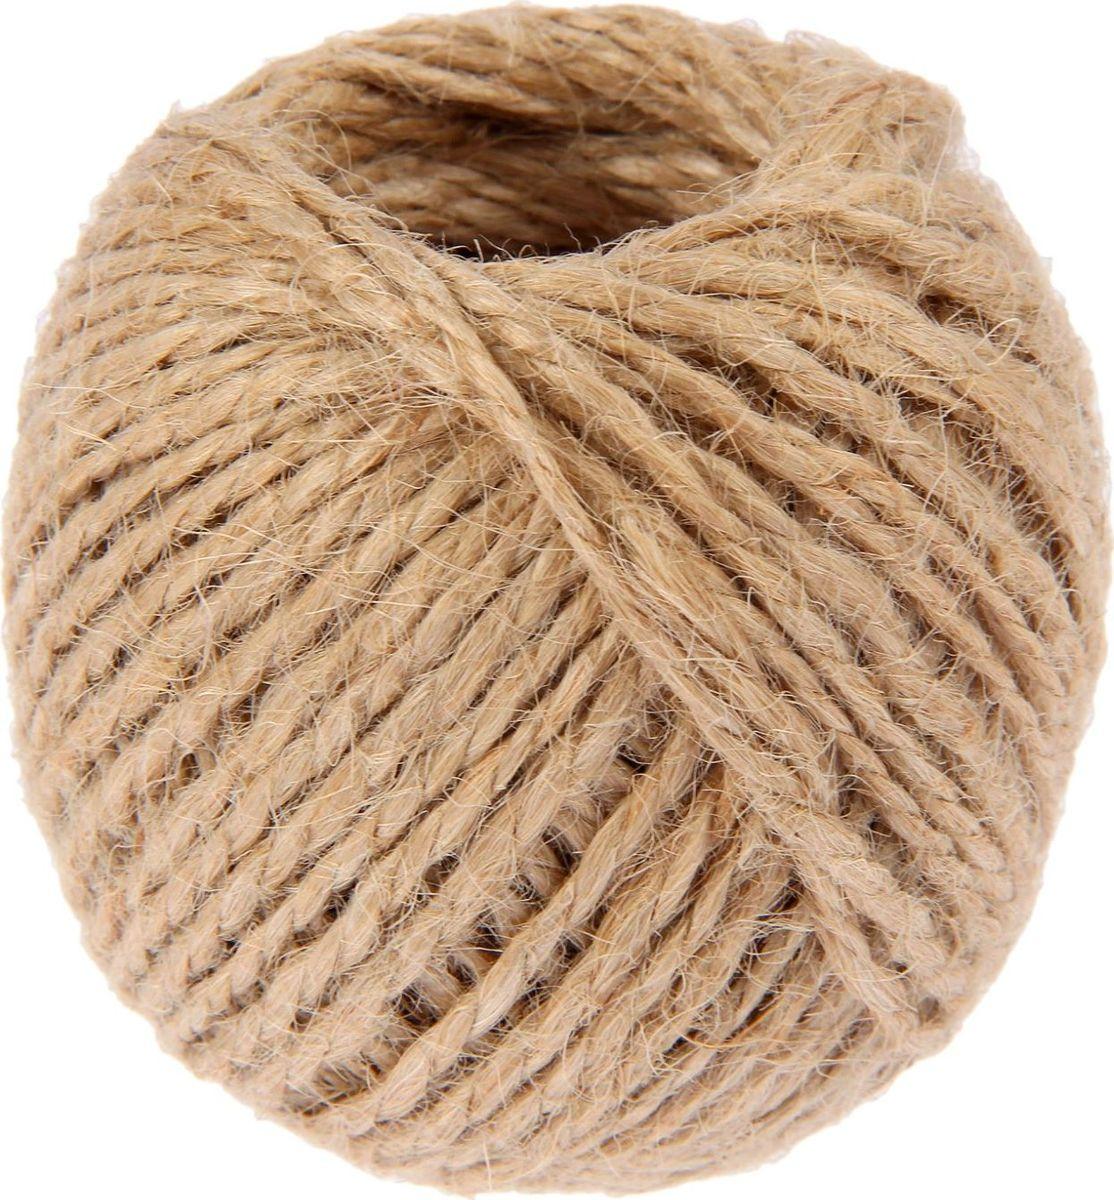 Шпагат джутовый, скрученный, цвет: натуральный, 1,5 мм, 30 м2259304